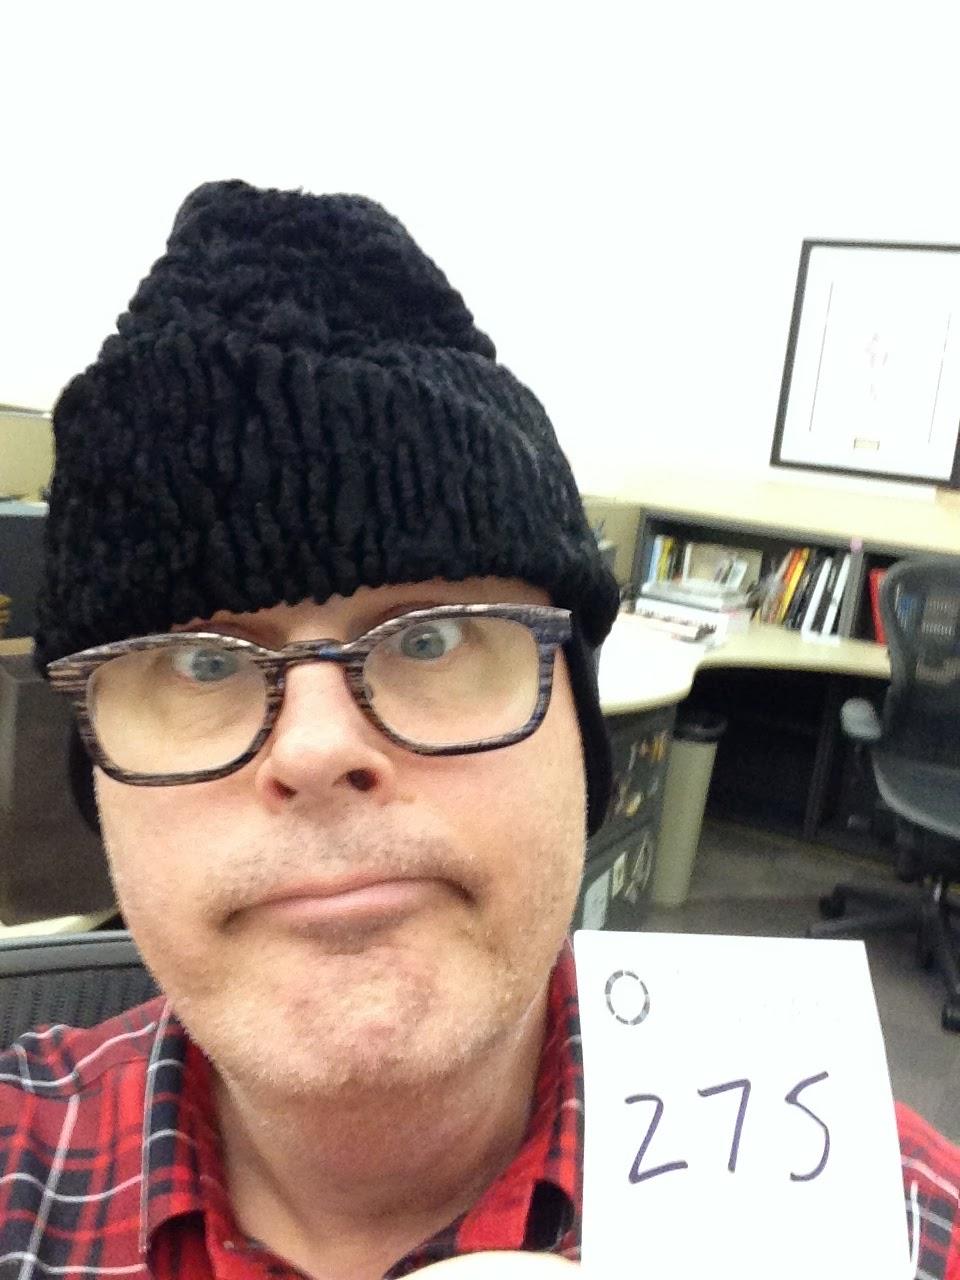 19e58fa4c92 Adam s Riff  Project Cubbins  Hat 275 - Russian Diplomat s Black ...